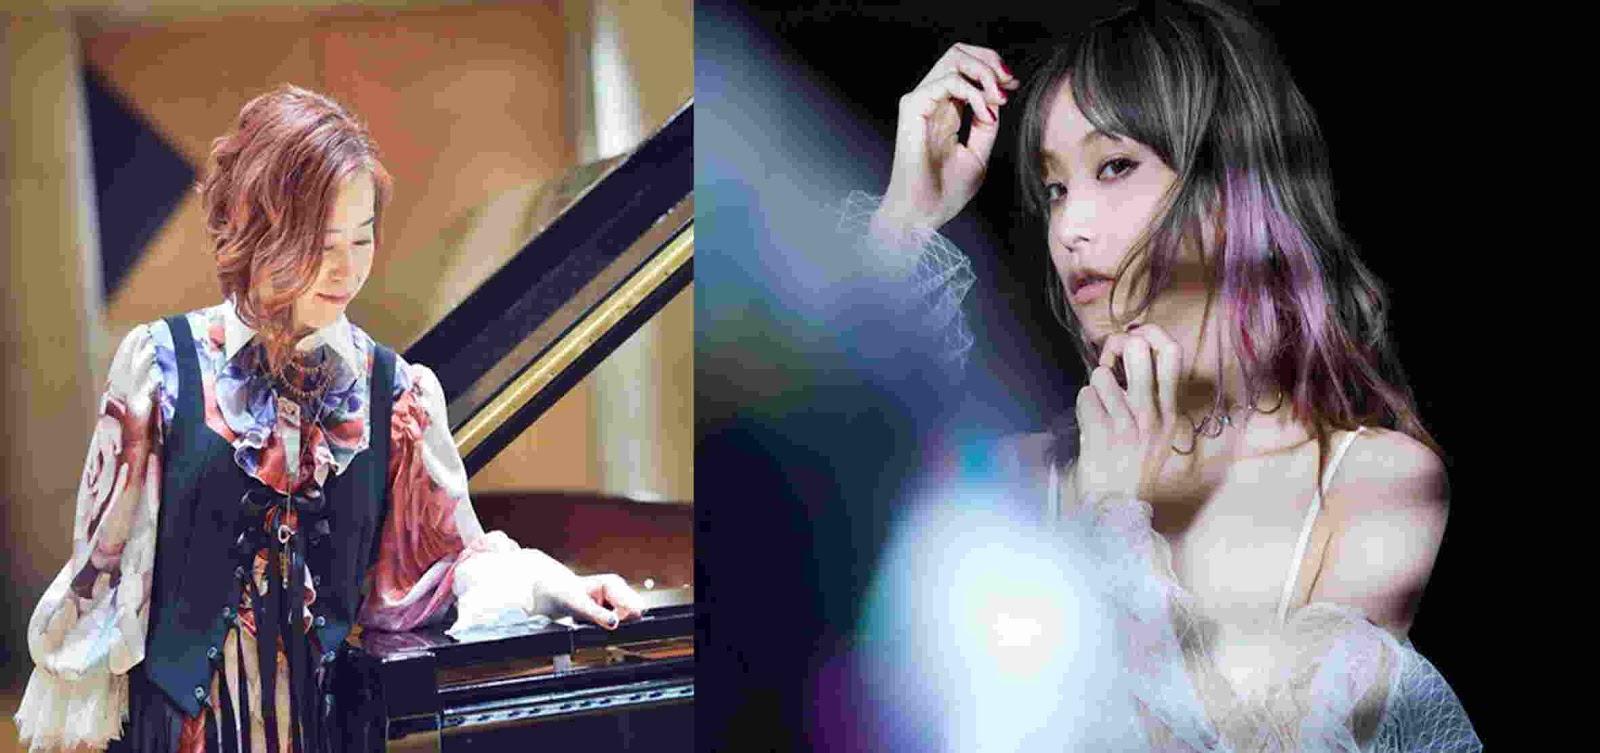 FictionJunction feat. LiSA Menyanyikan Ending Dari Anime Kimetsu no Yaiba